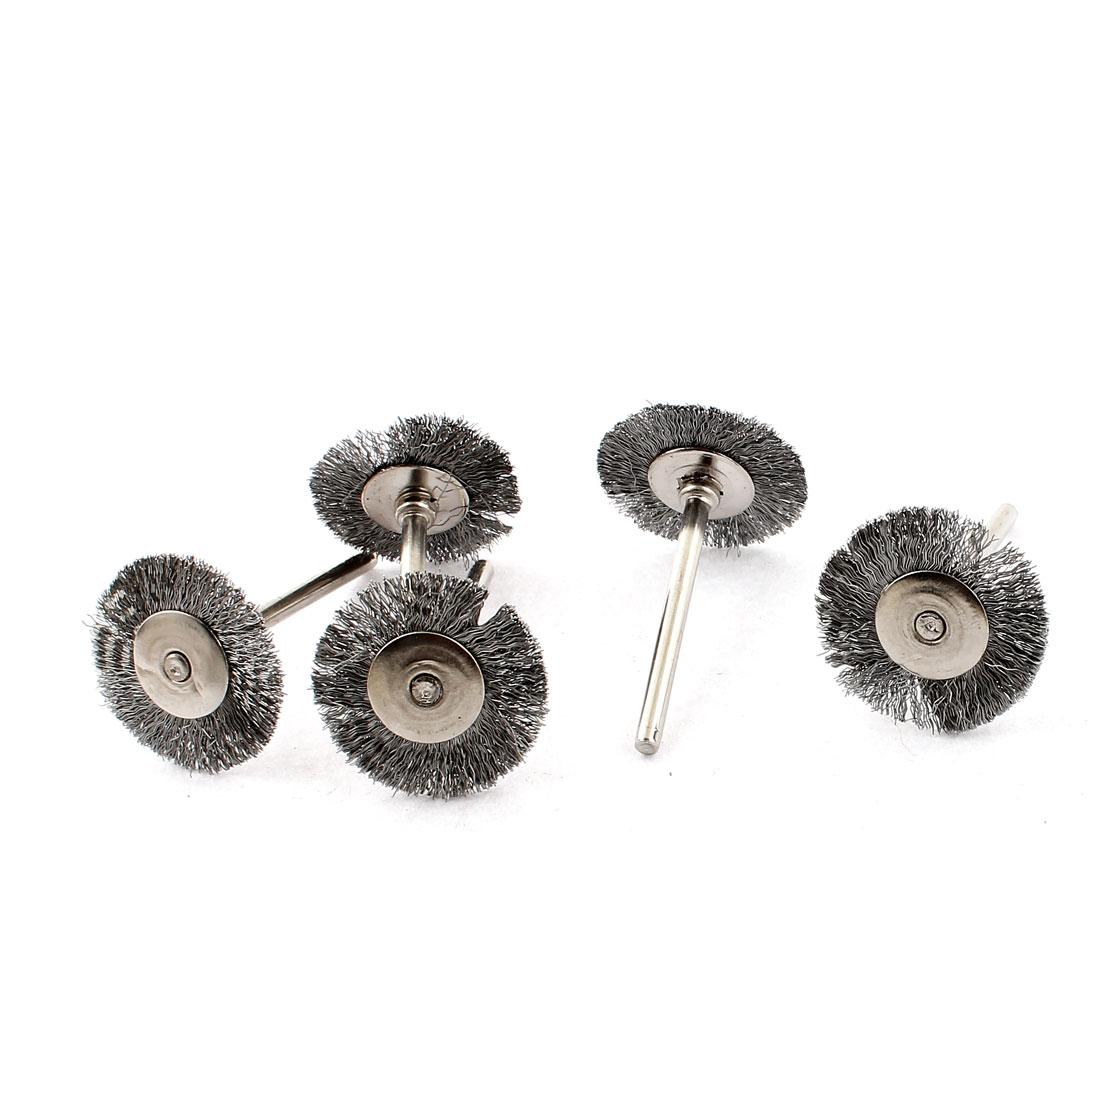 5pcs 25mm Steel Pad Metal Straight Shank Polishing Buffing Wheel Brush Tool